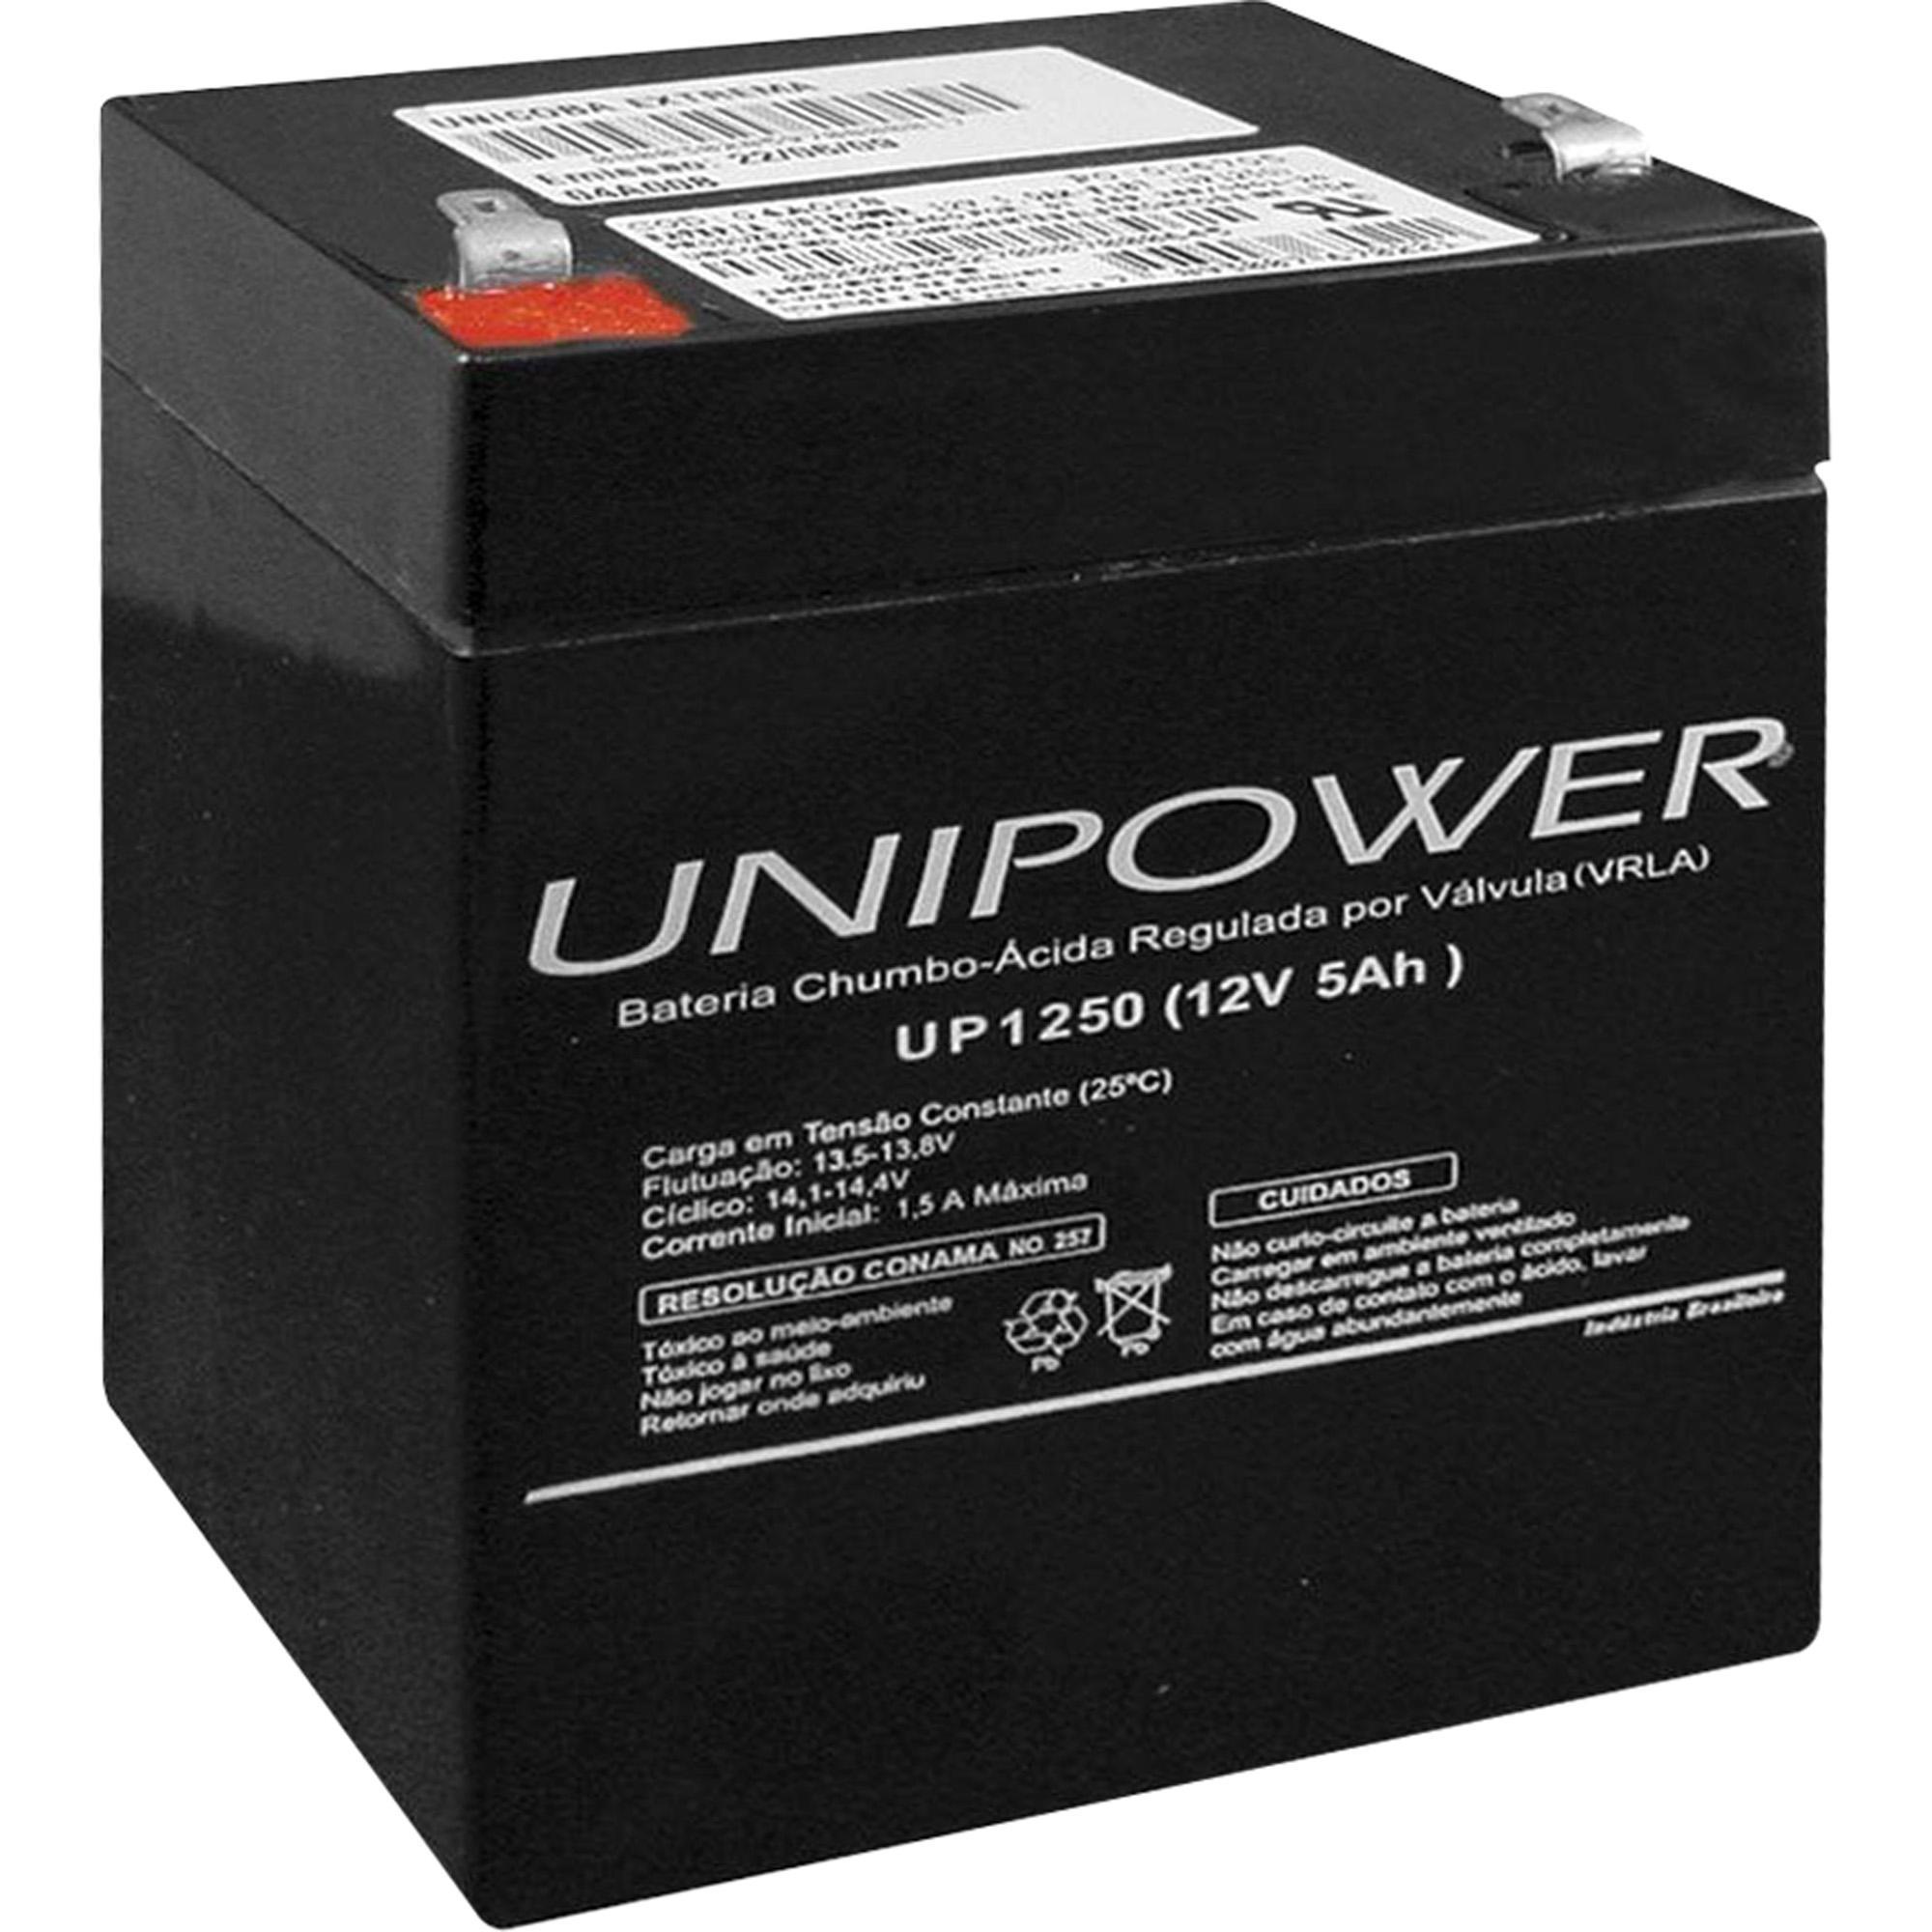 Bateria Selada 12V 5AH UP1250 Preta UNIPOWER